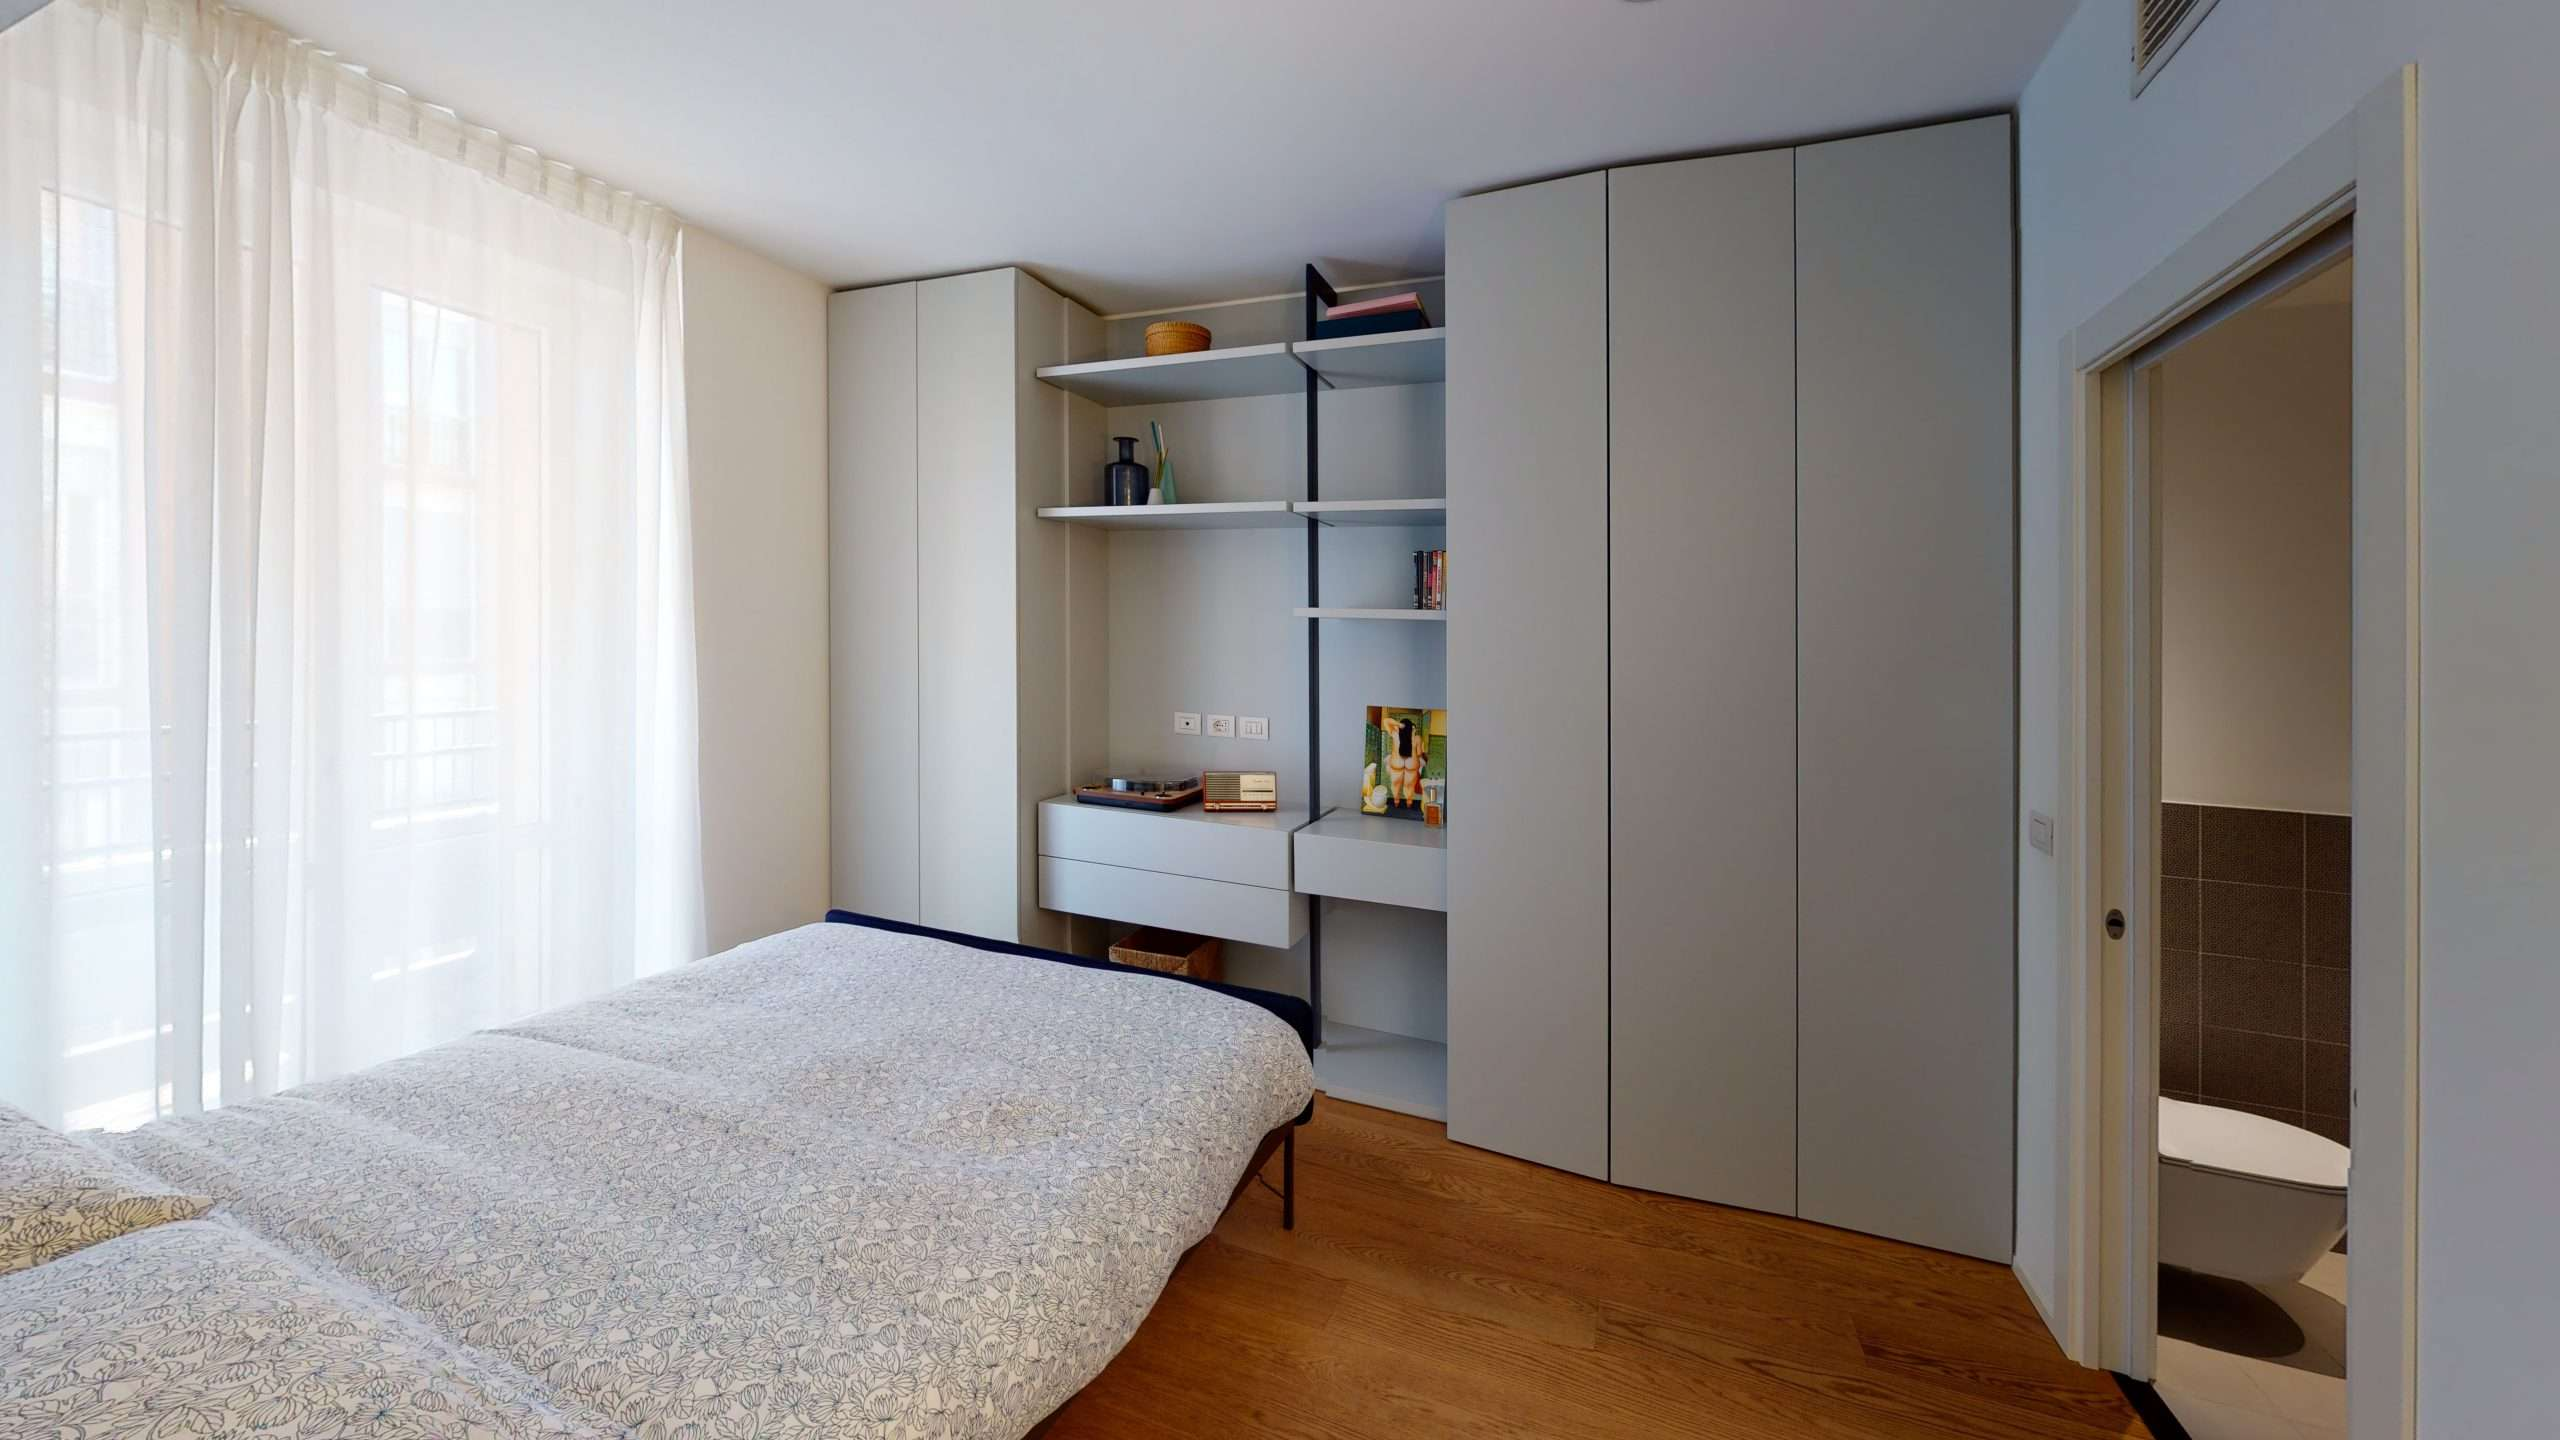 Via-Viotti-13-Milano-Bedroom(2a)